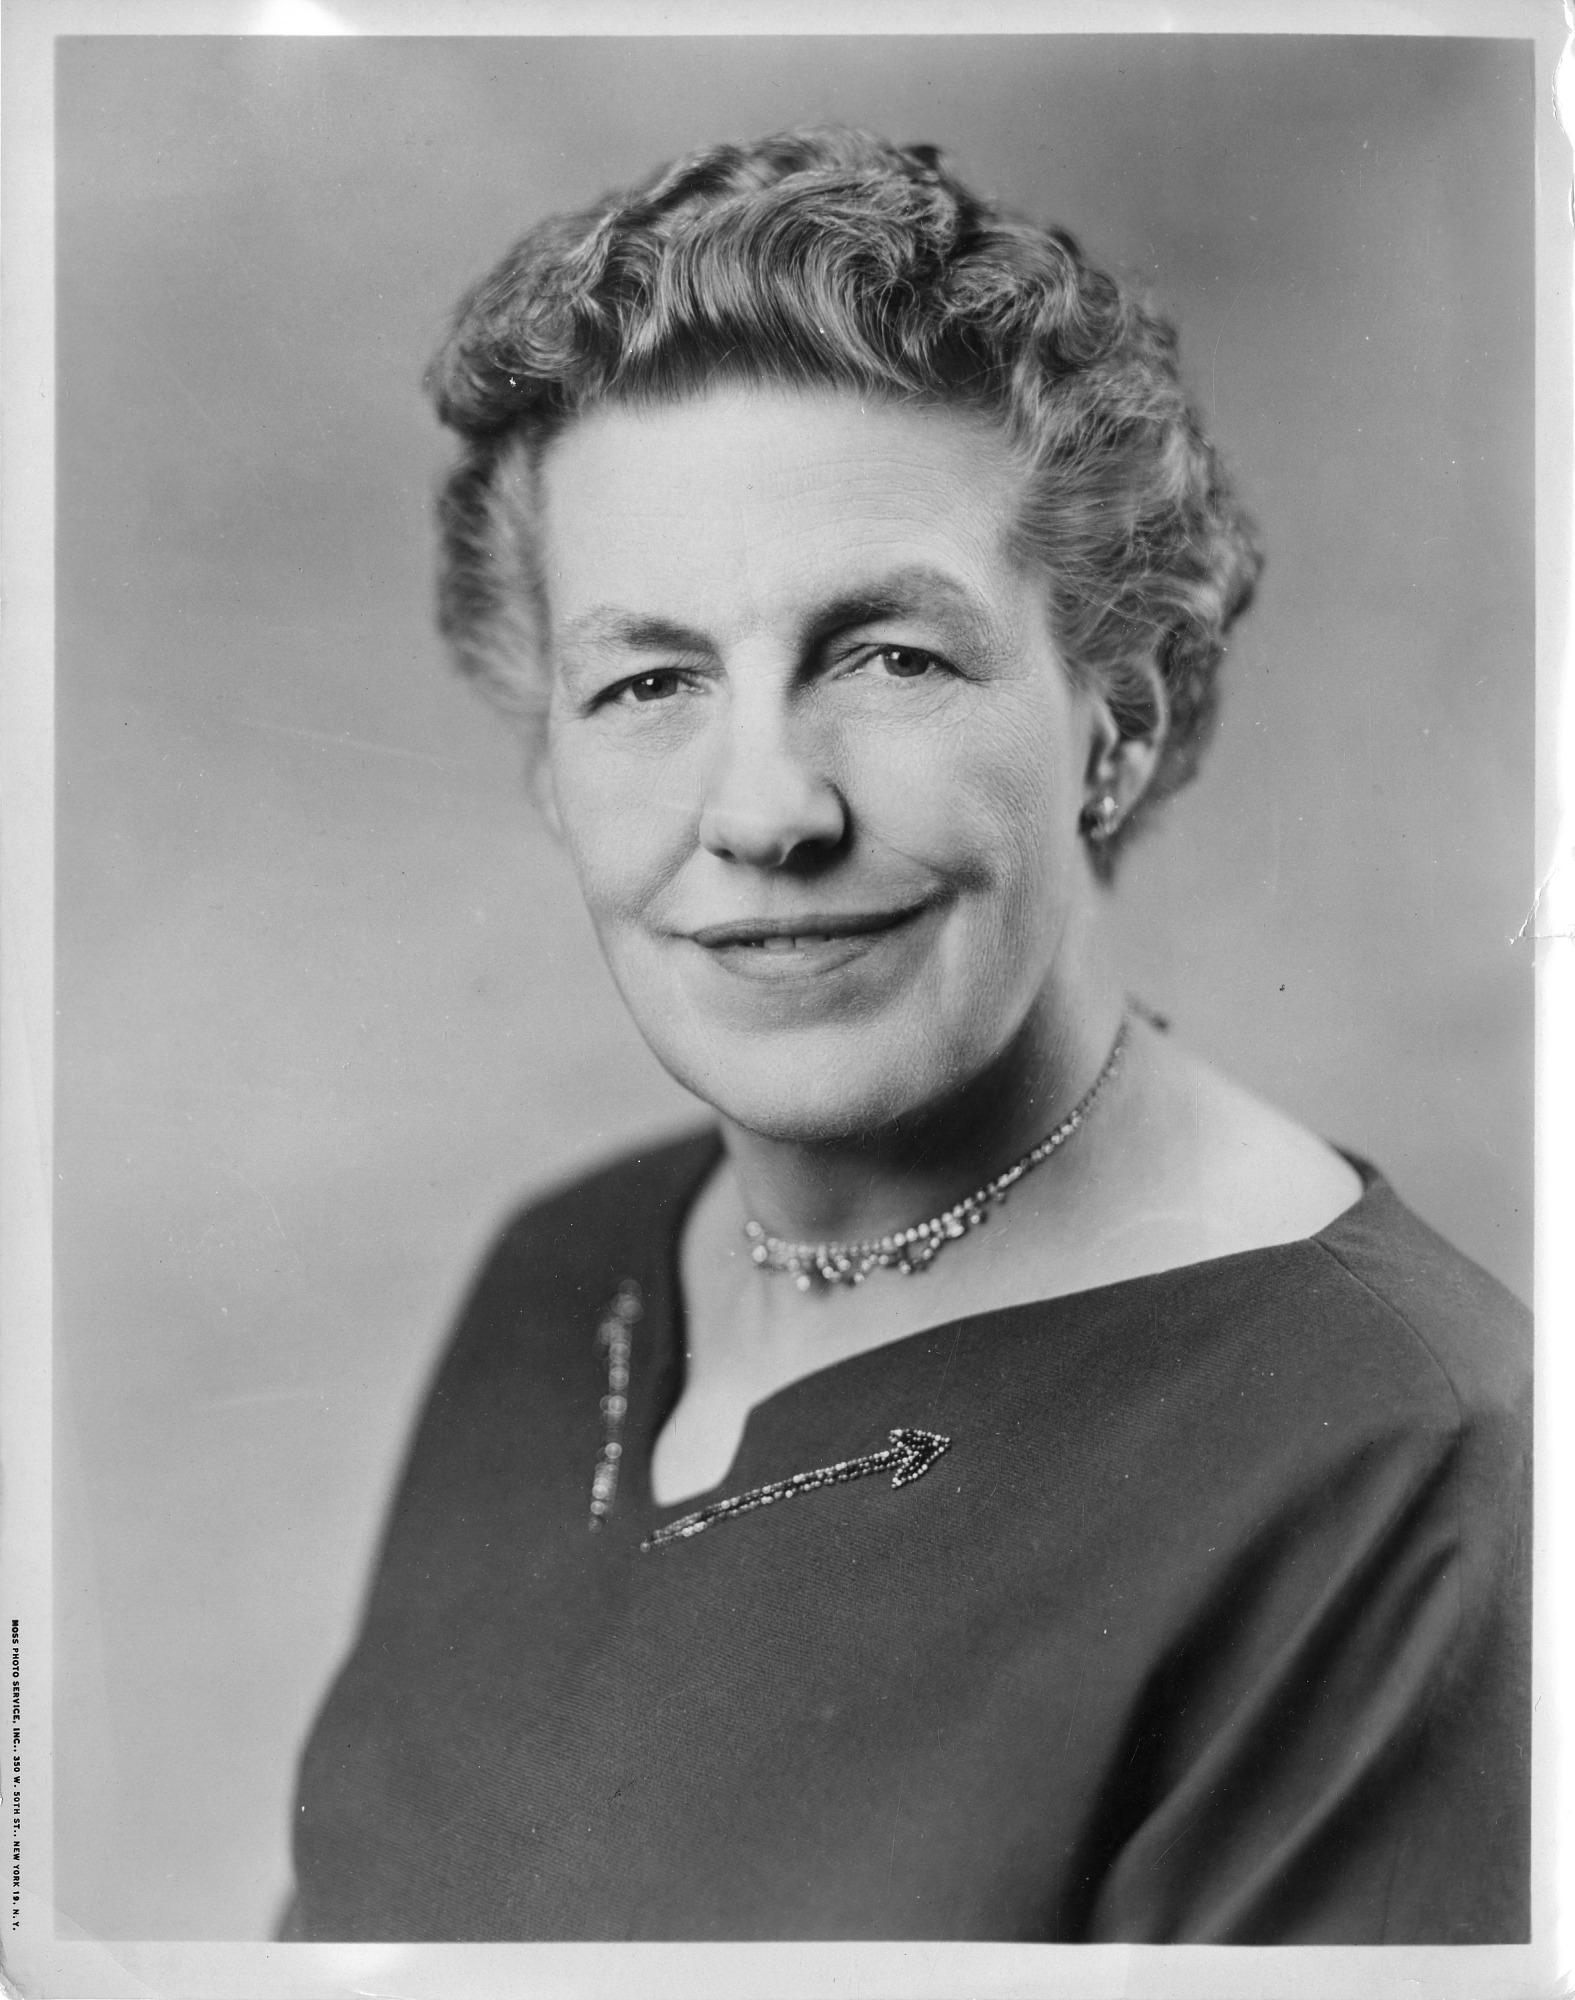 Mary Elizabeth Switzer (1900-1971)